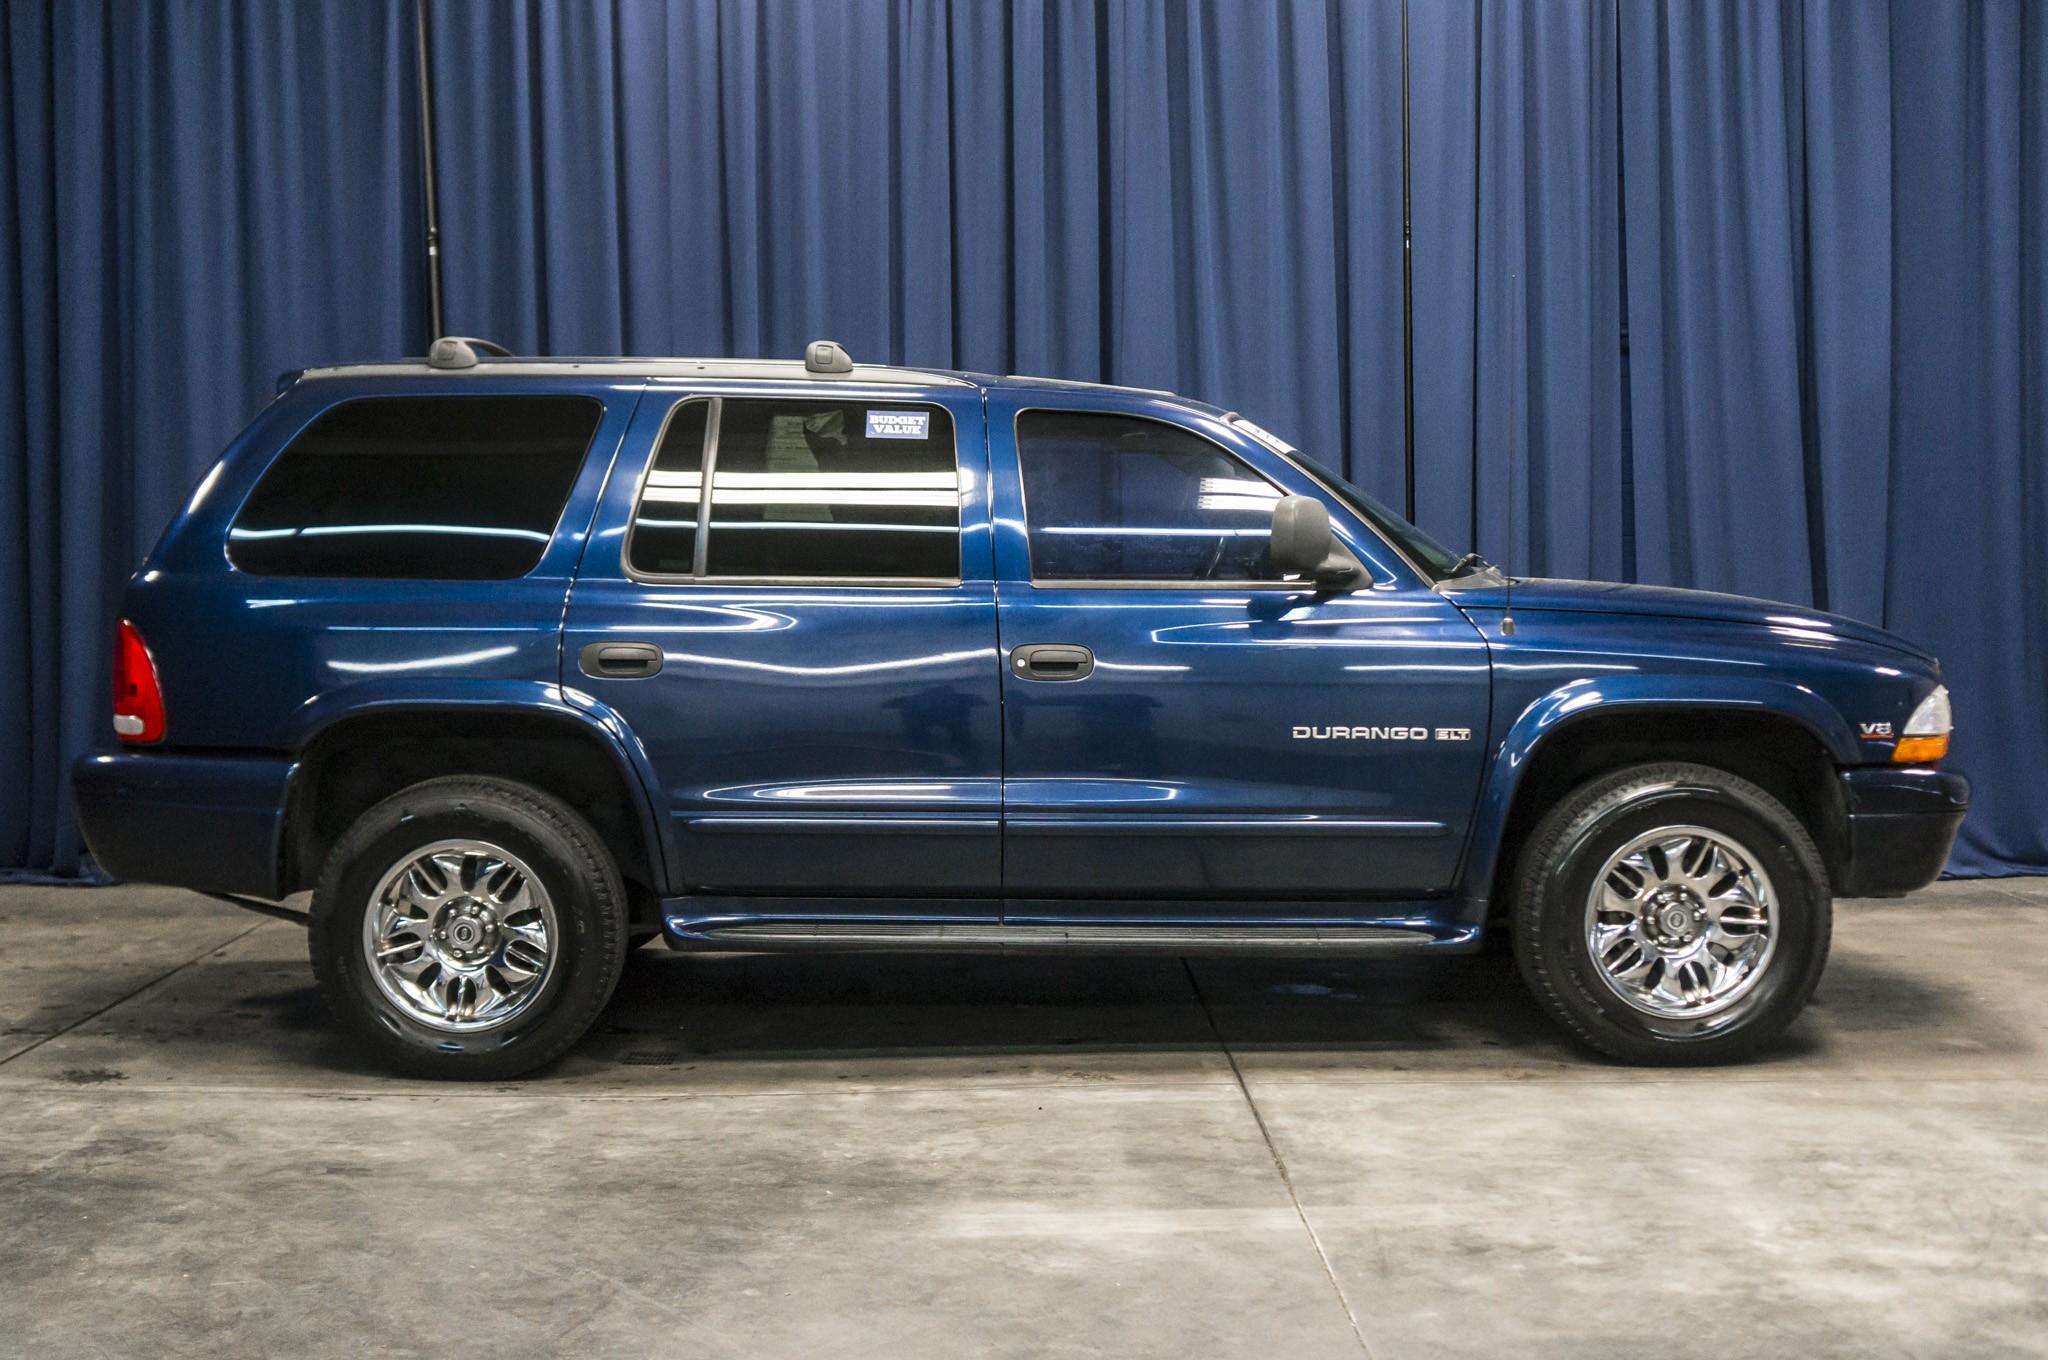 Used 2000 Dodge Durango 4x4 SUV For Sale - 39832A